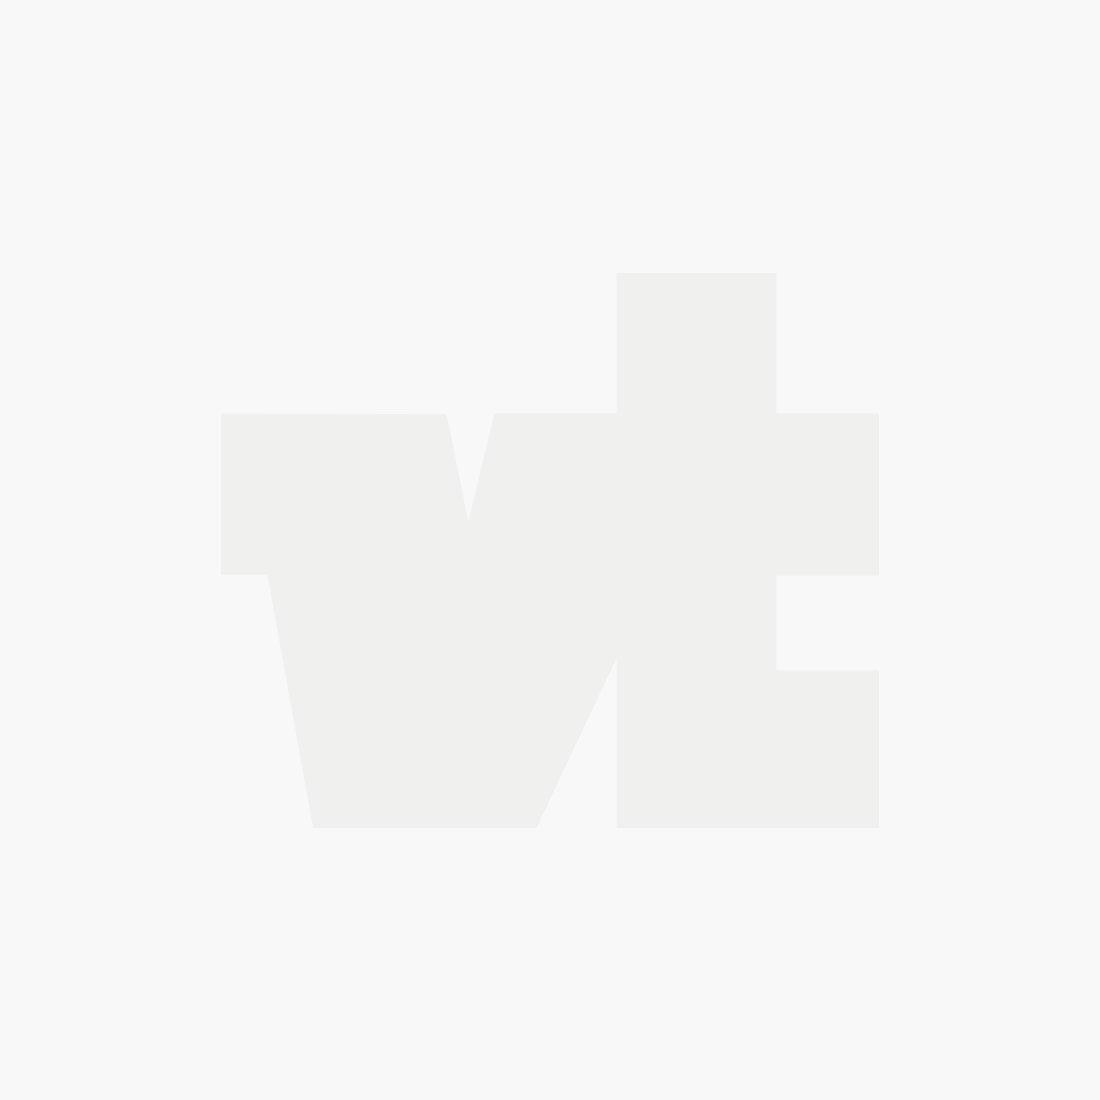 Vintage logo classic scarf black